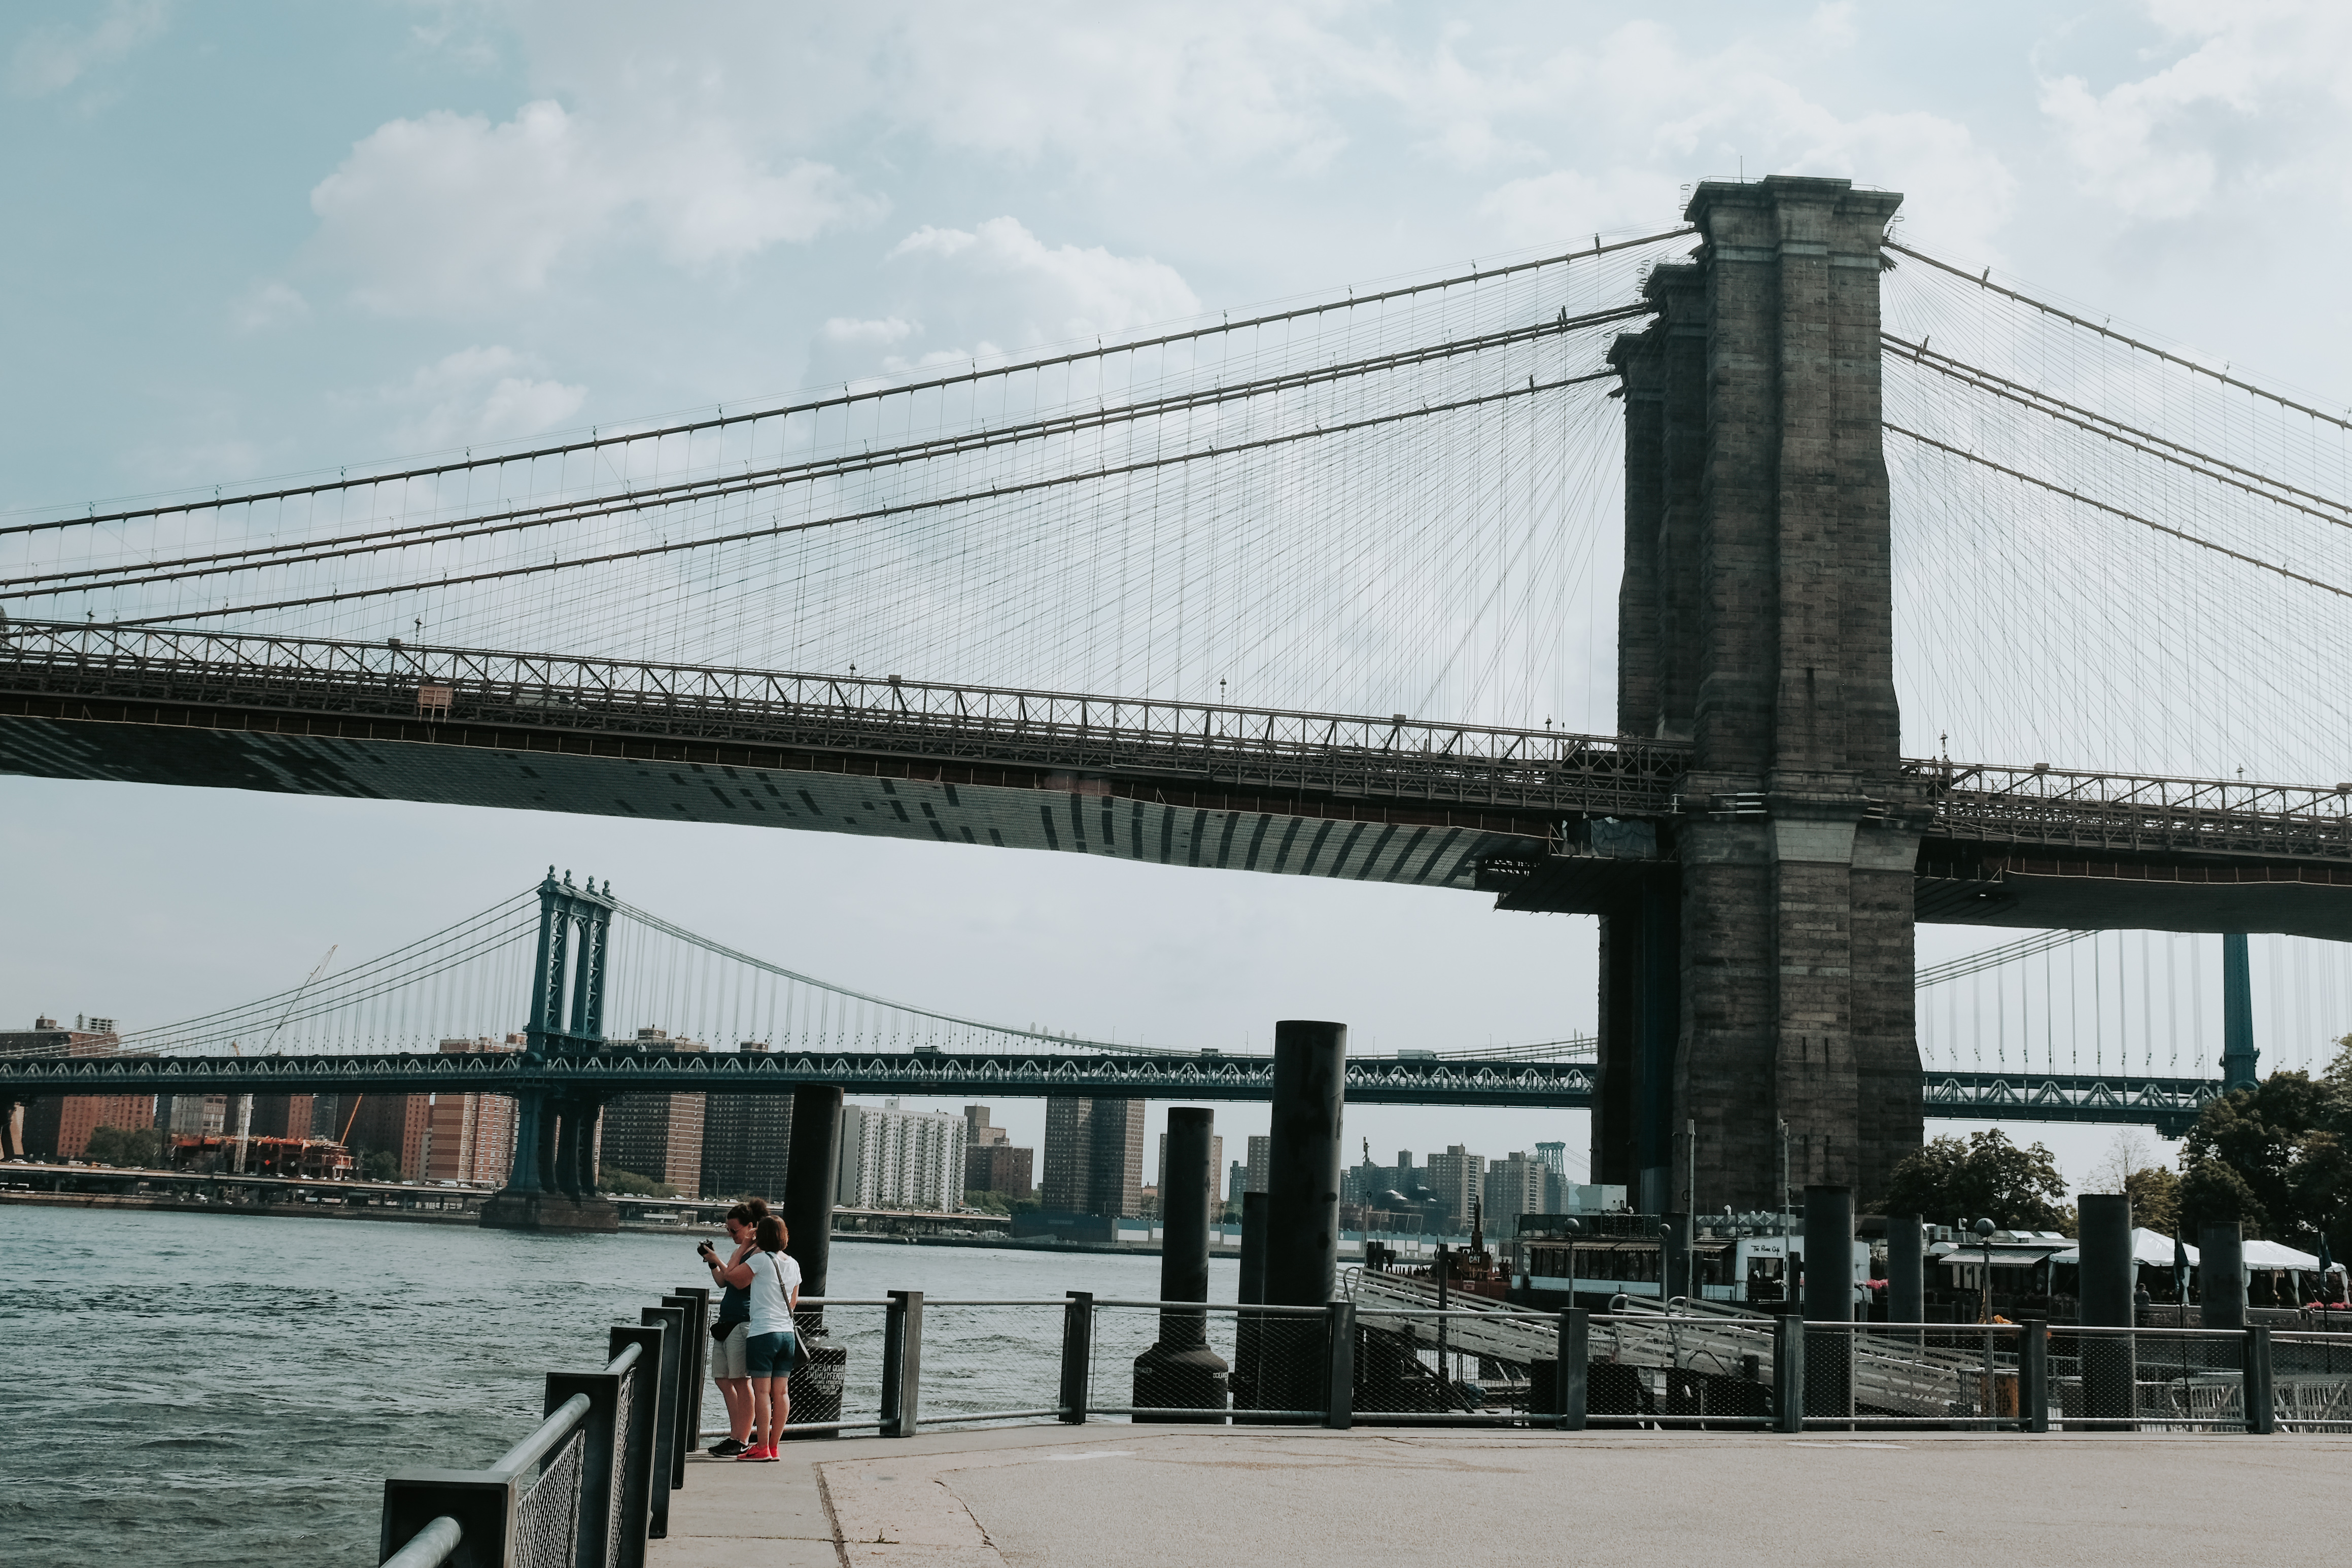 newyork-melissamilis-175